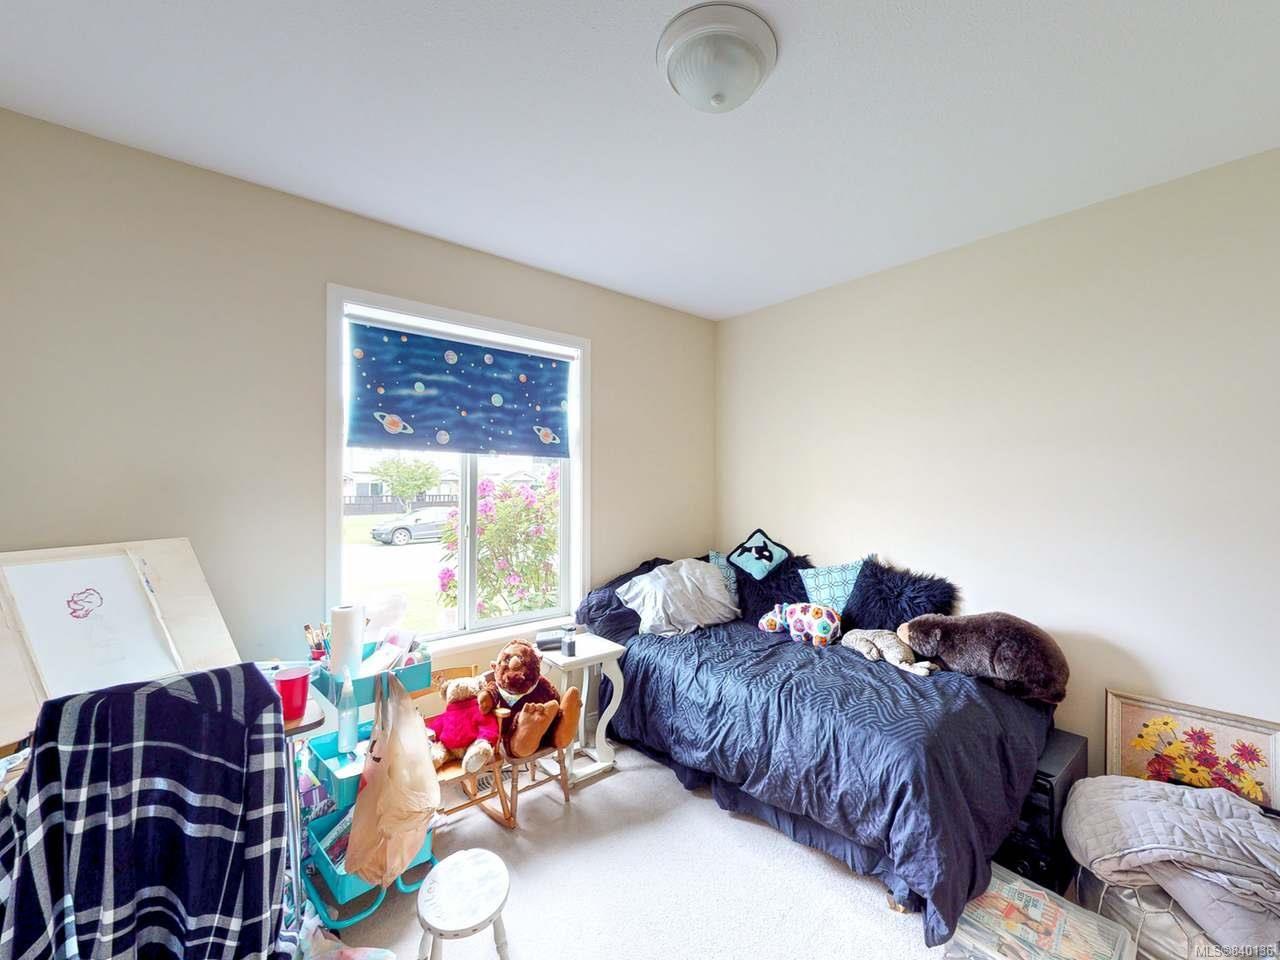 Photo 21: Photos: 5484 W Woodland Cres in PORT ALBERNI: PA Port Alberni House for sale (Port Alberni)  : MLS®# 840136